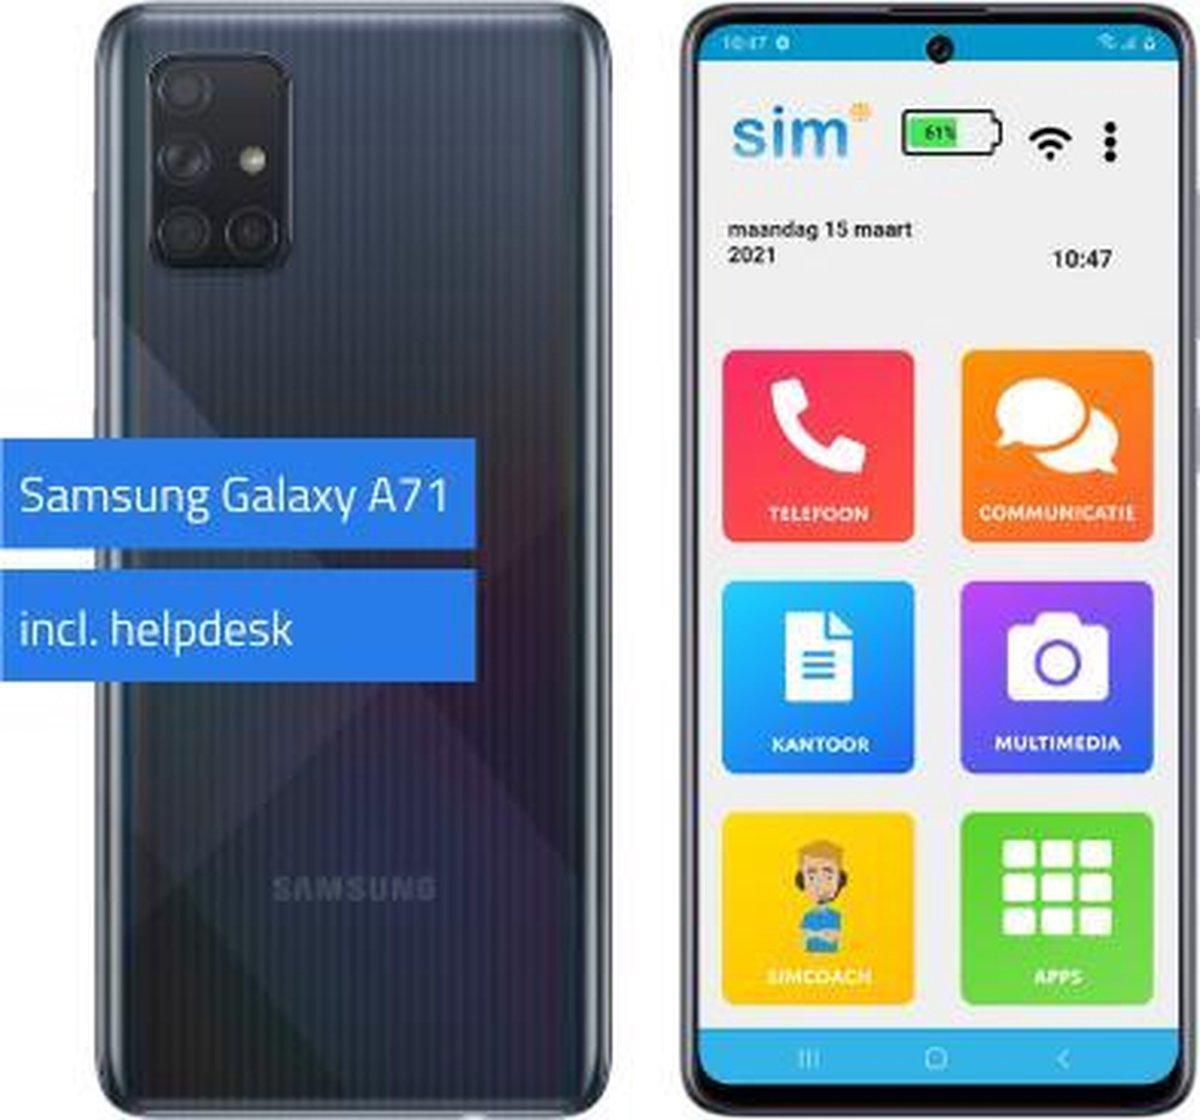 SimPhone 4 (SA71) senioren smartphone 128GB incl. ondersteuning bij gebruik.